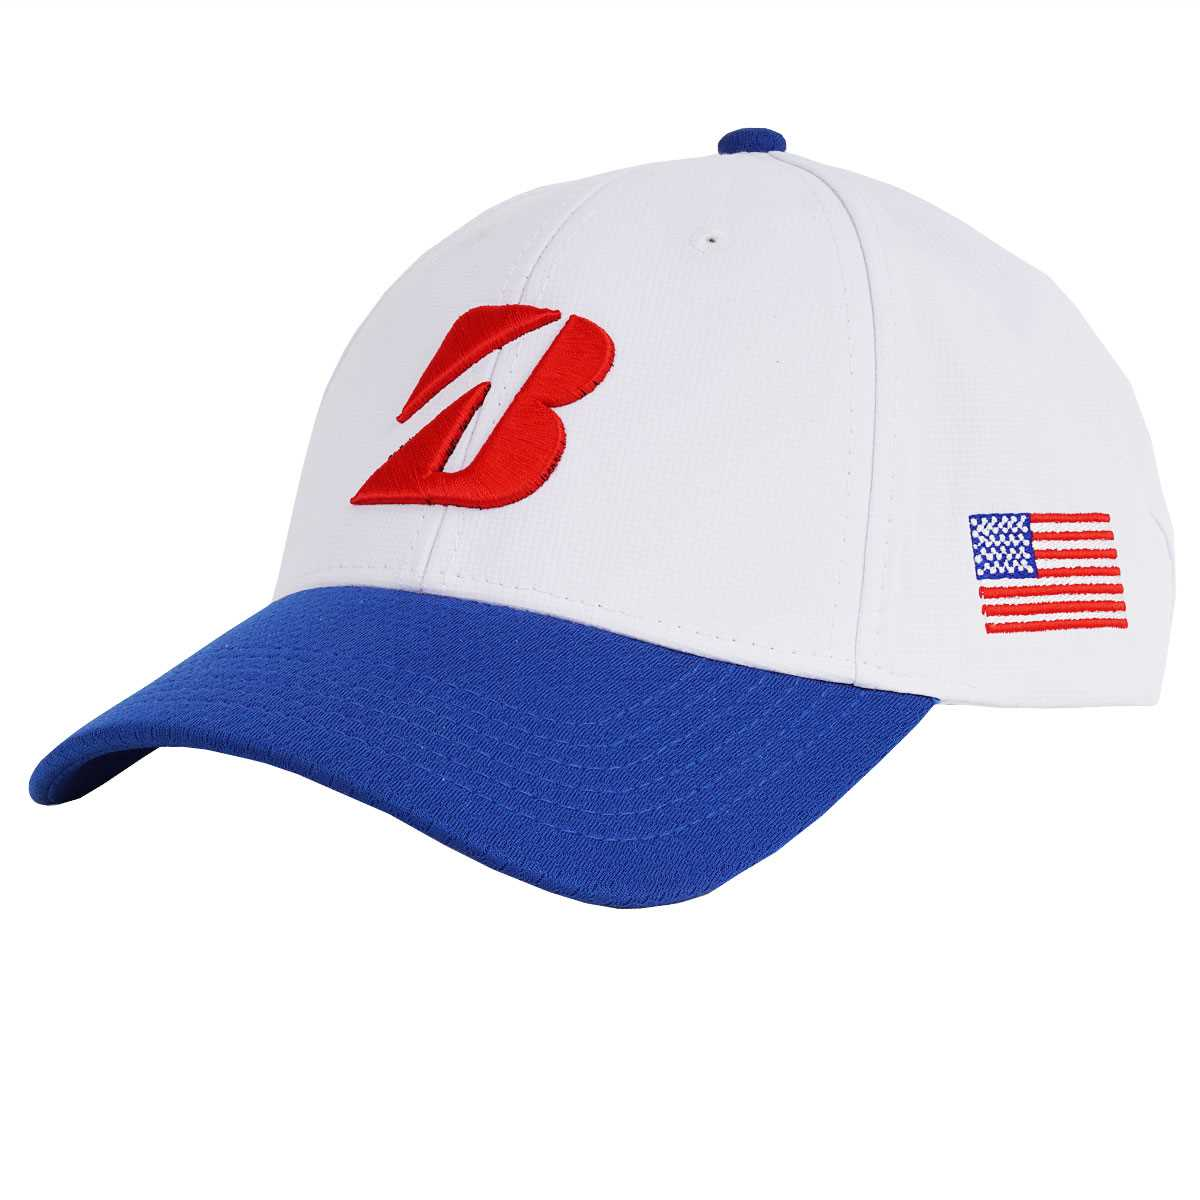 09d3f49710d1e Bridgestone Golf 2016 US Open Adjustable Hat (Red White) - Blue White